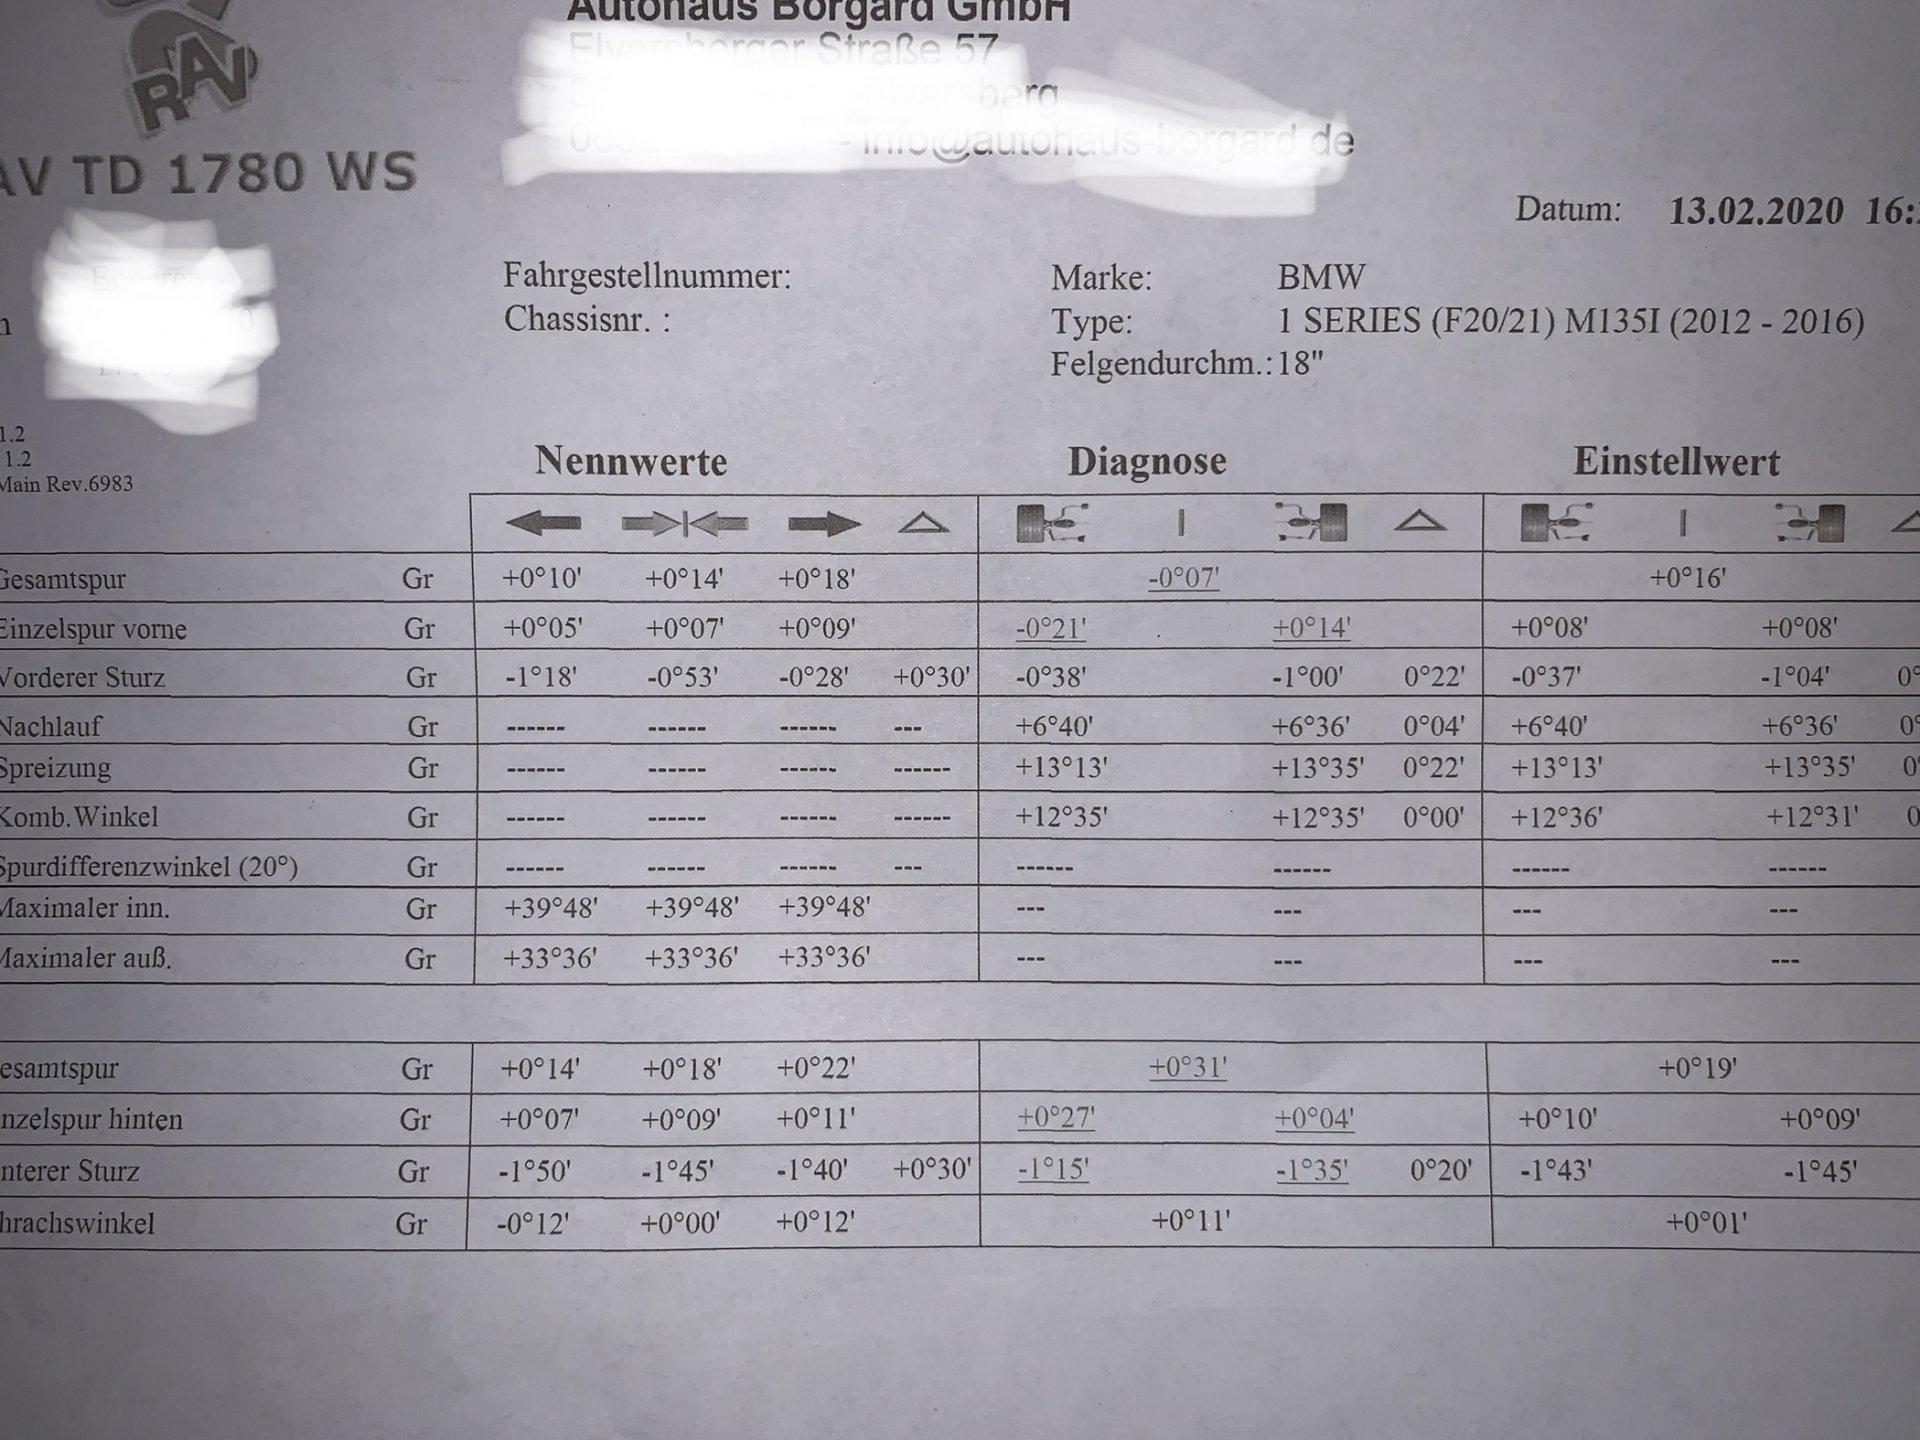 6C8B5128-A489-468C-9DCC-E6FE410FB2E0.jpeg